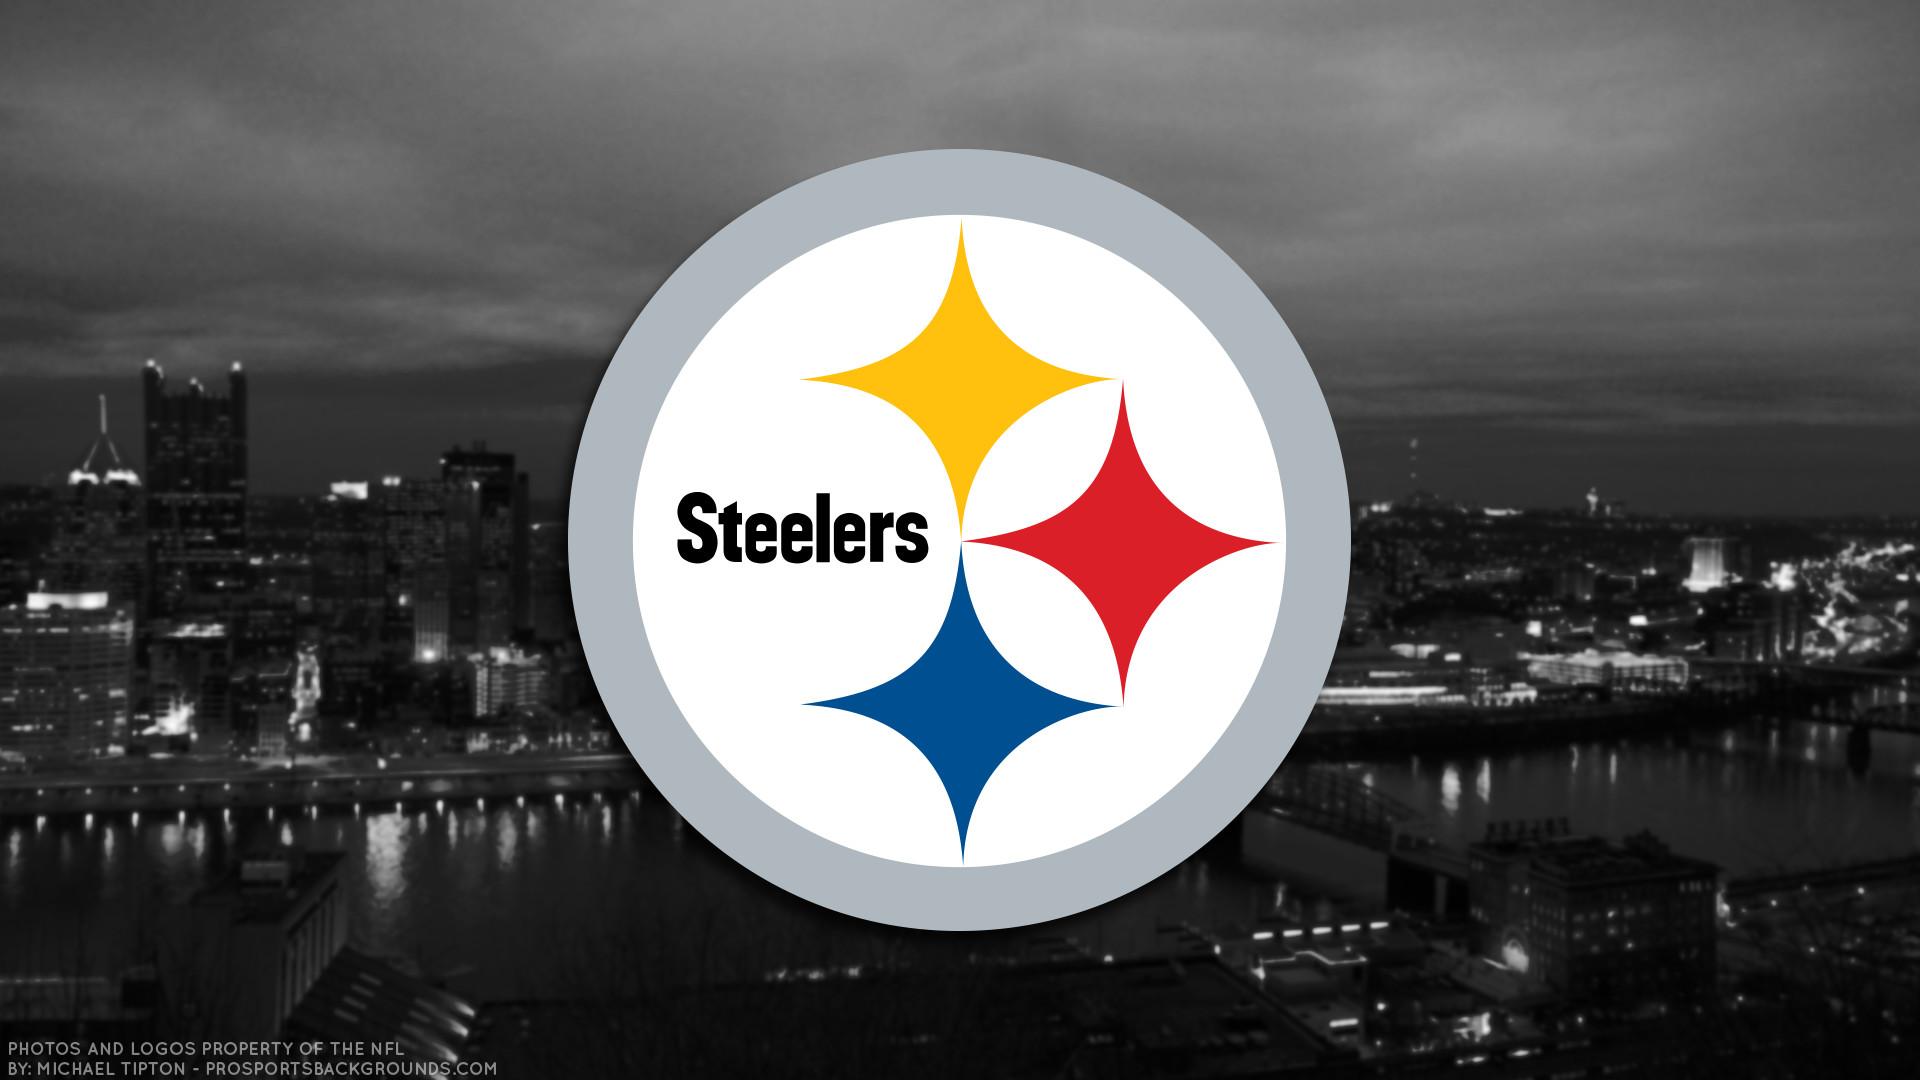 … Pittsburgh Steelers 2017 football logo wallpaper pc desktop computer …